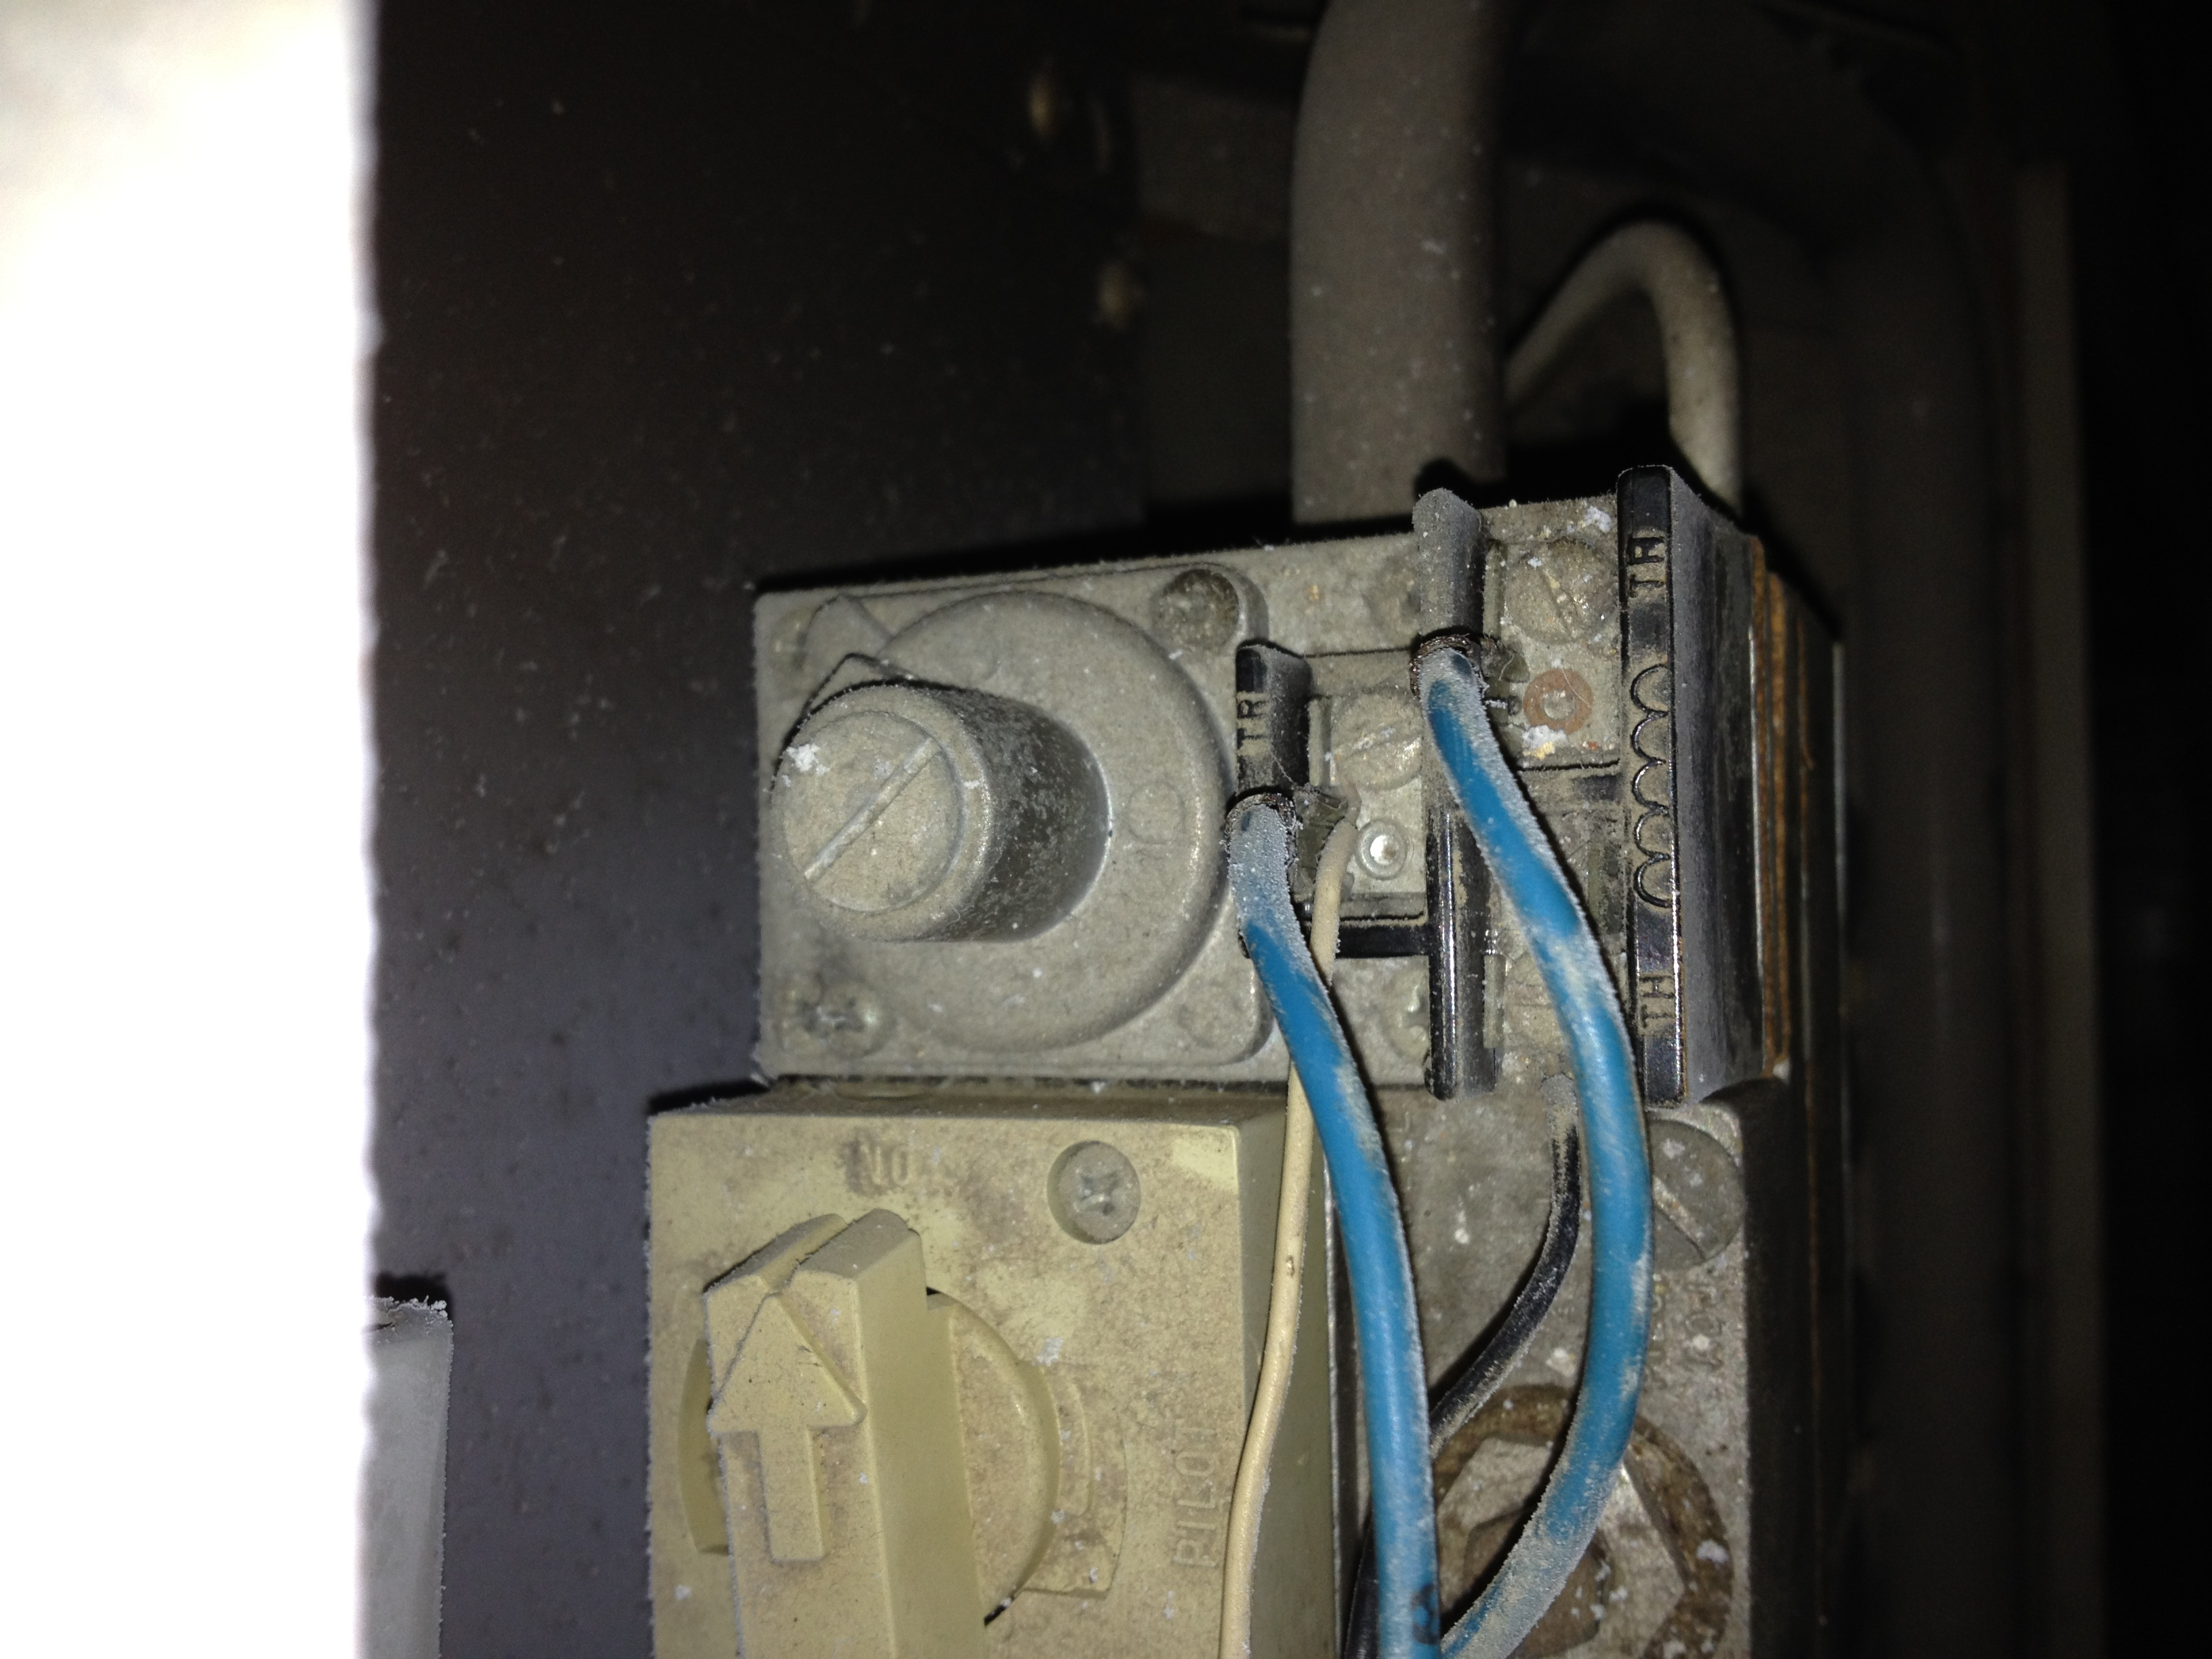 wiring diagram lennox hvac the wiring diagram lennox furnace thermostat wiring diagram nilza wiring diagram